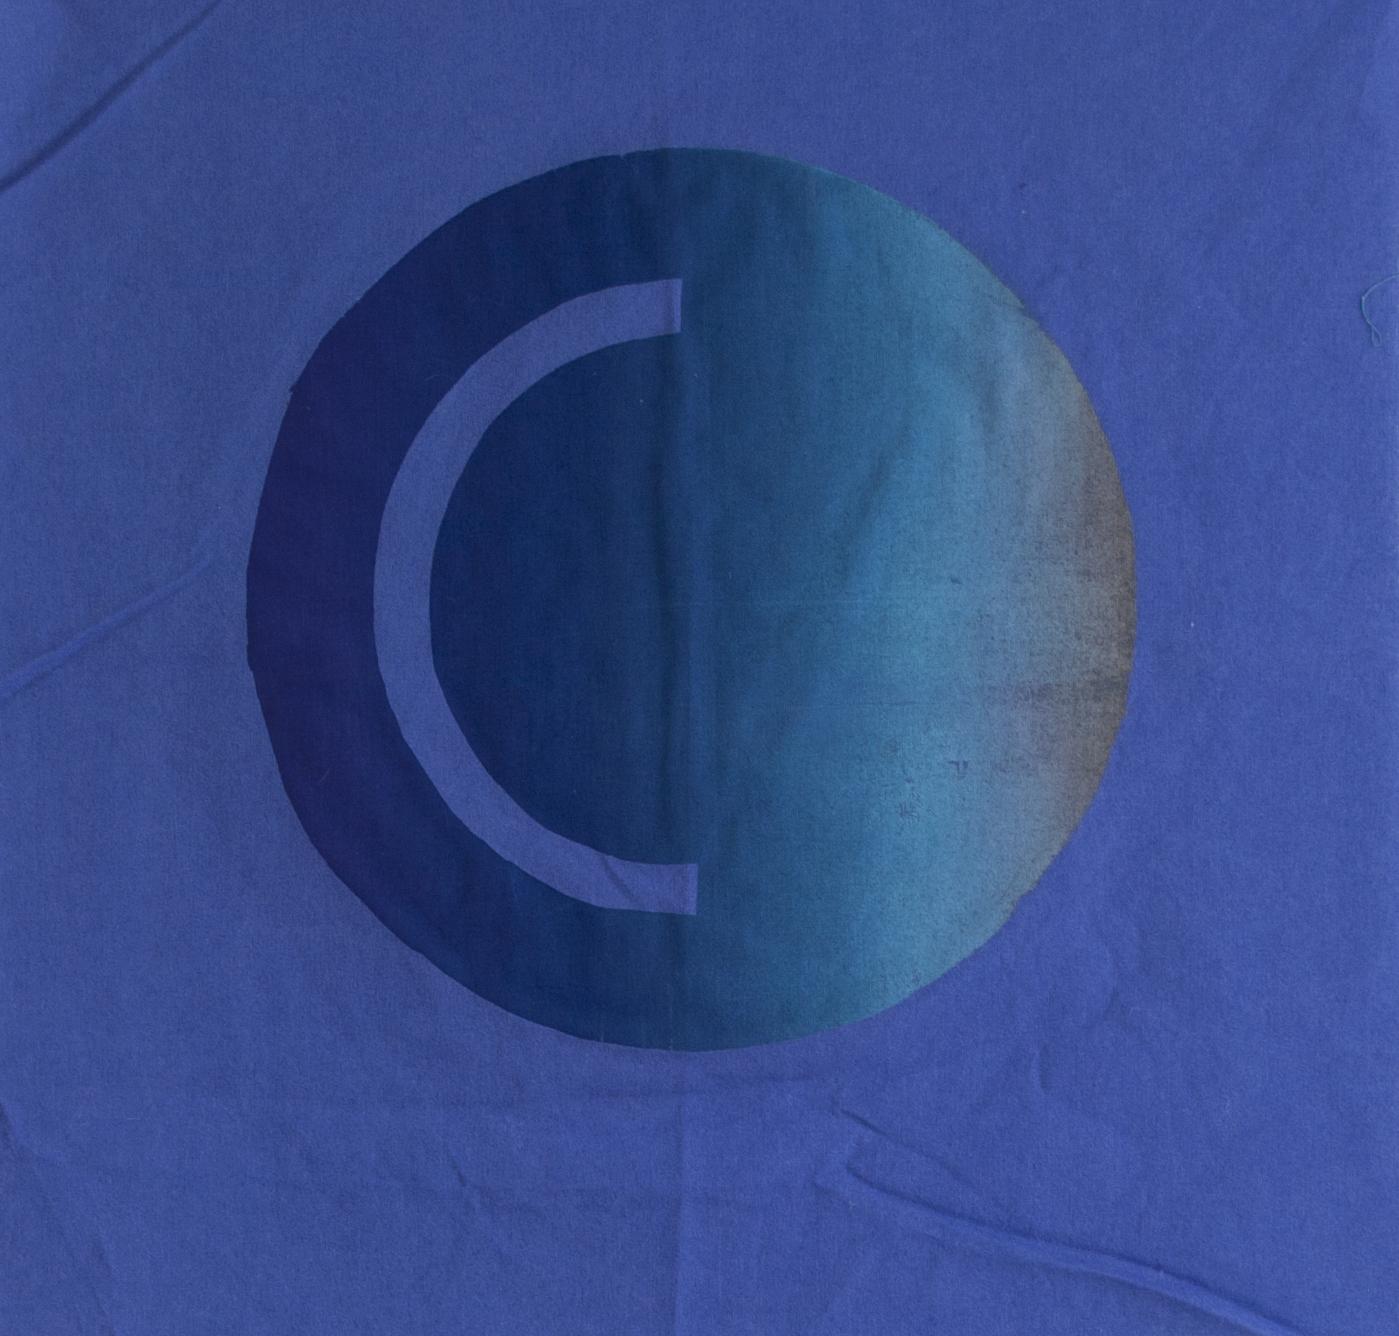 Luna Blue  Screenprint on fabric 17 x 17 in 2017